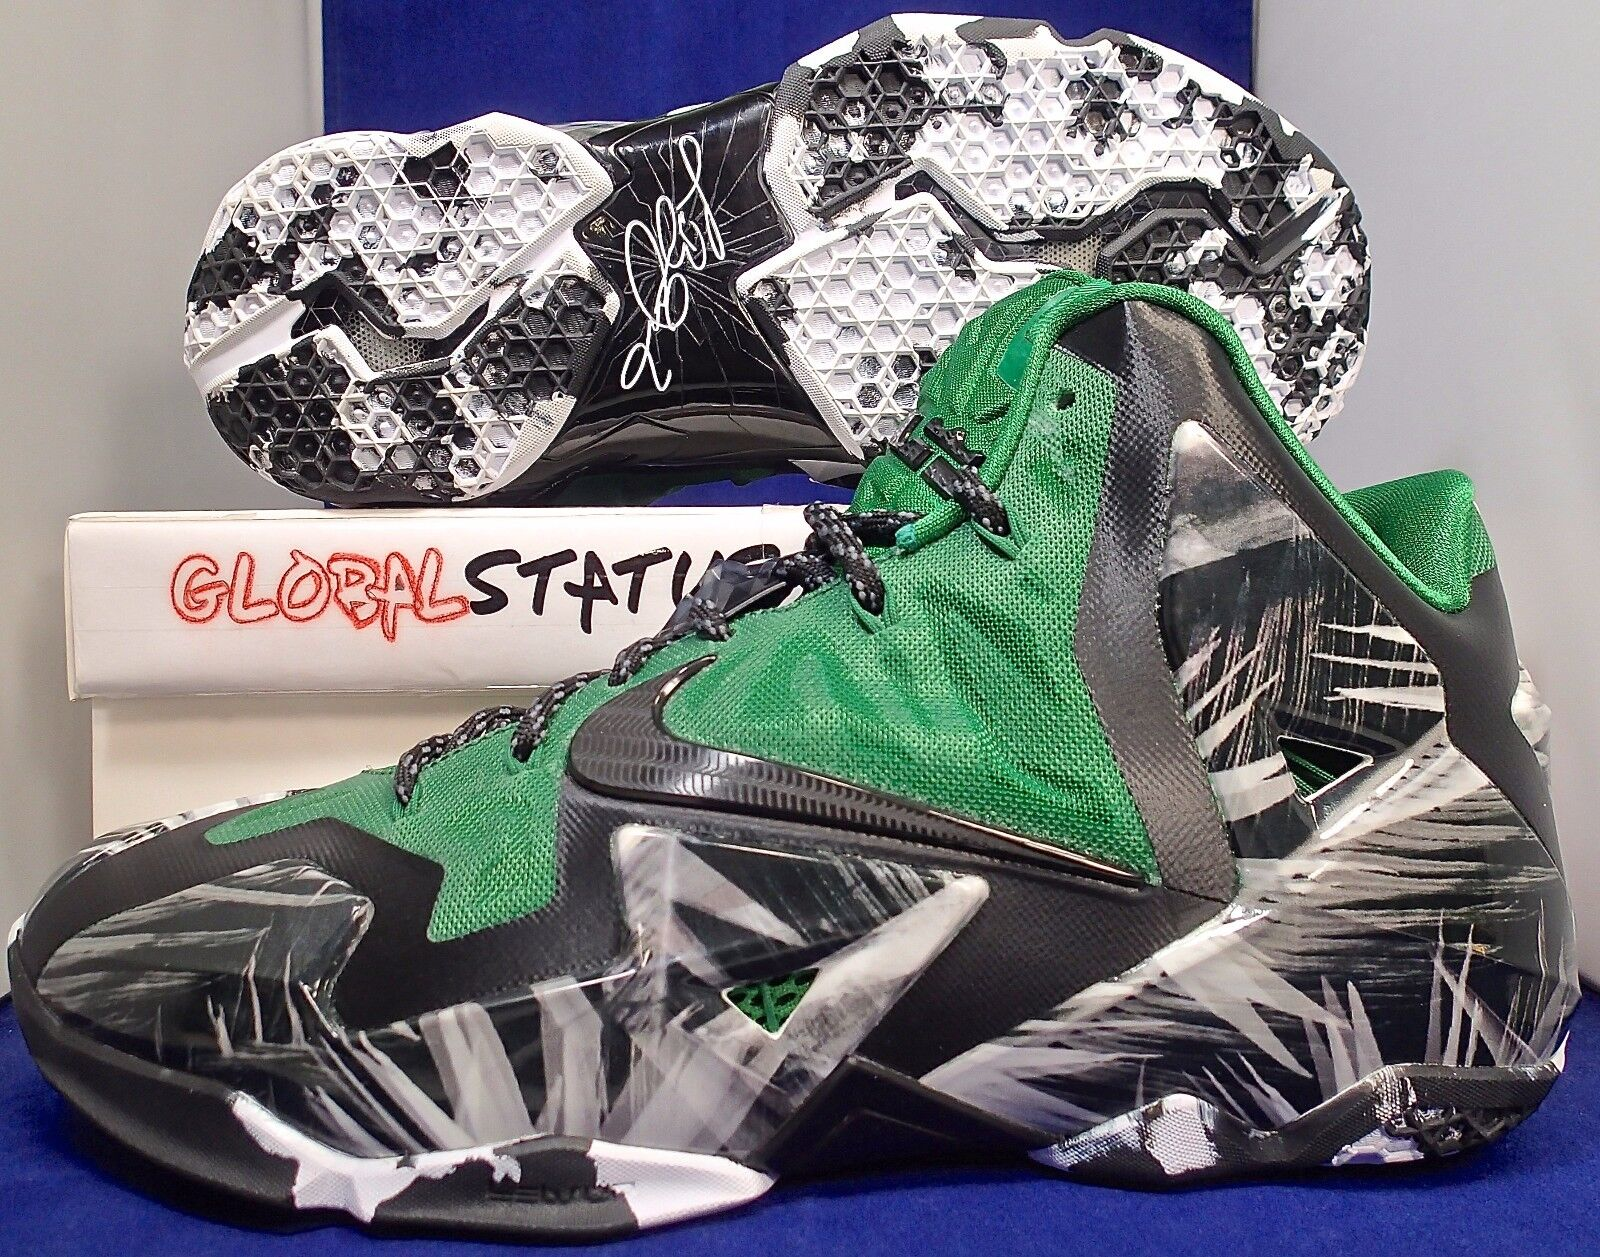 vnds nike id lebron grüne xi everglades schwarz - grüne lebron basketball - schuhe 641217 993 sz 10 54aae3